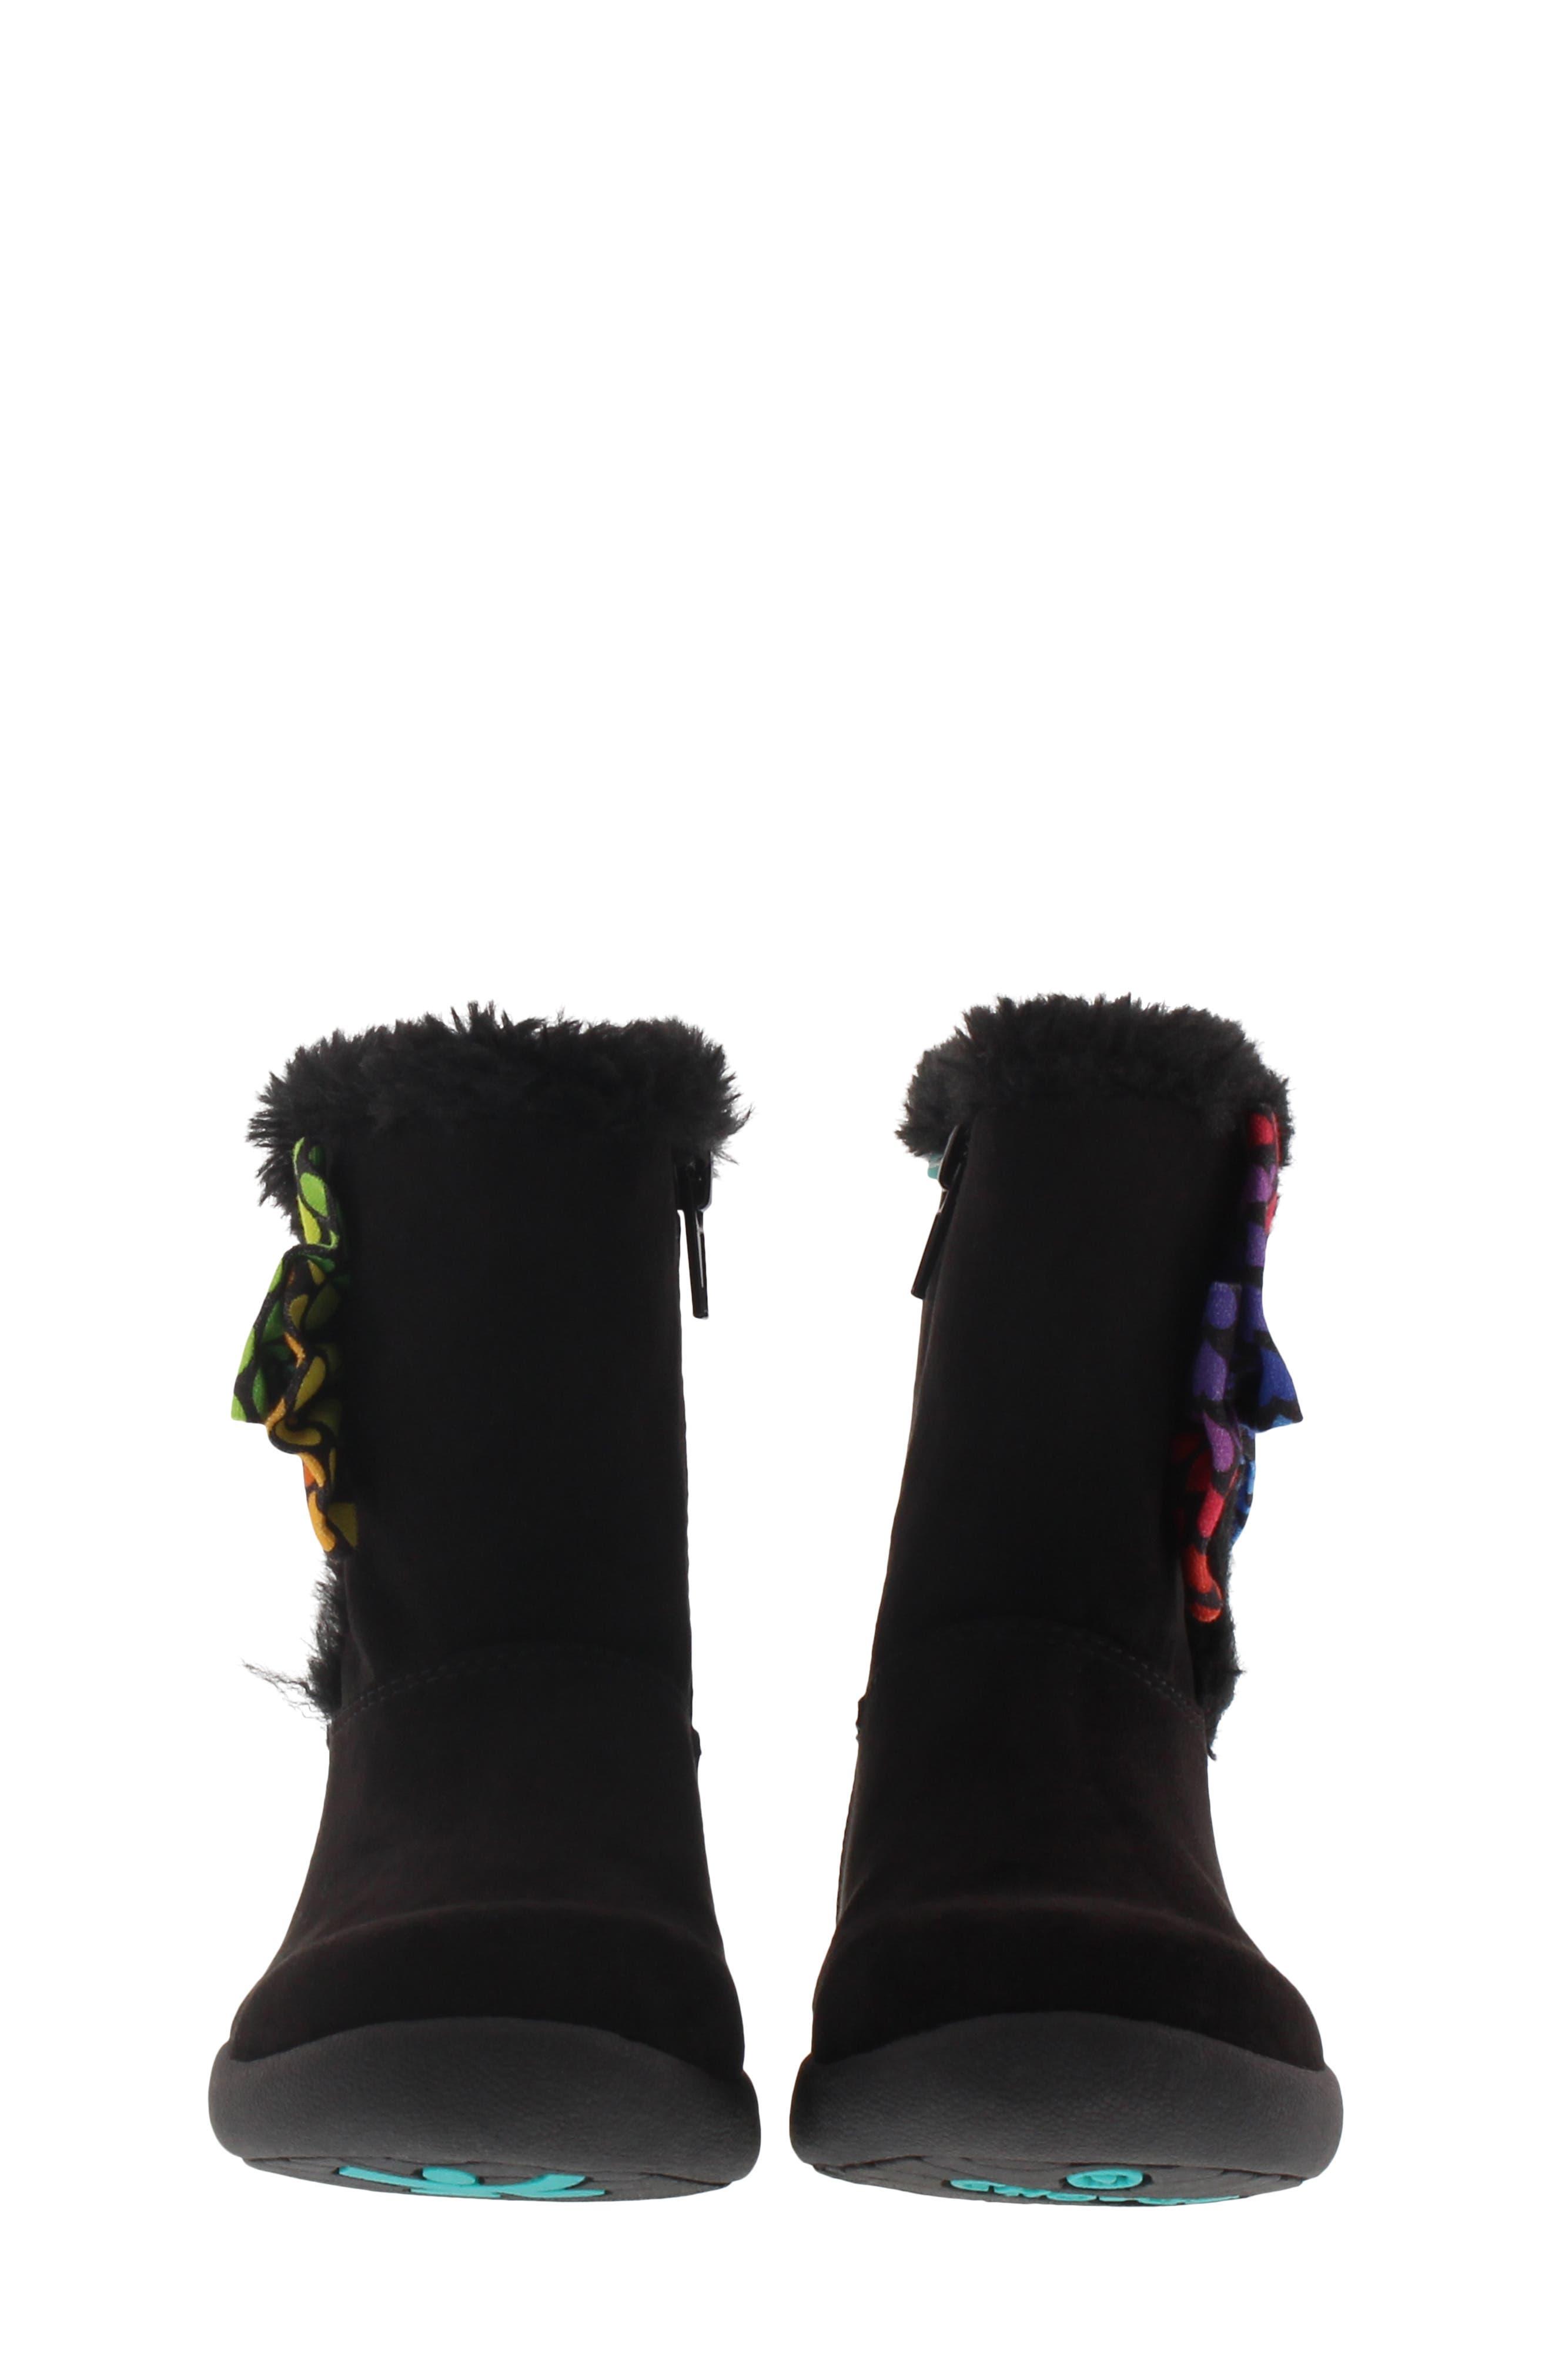 CHOOZE, Wish Faux Fur Lined Boot, Alternate thumbnail 4, color, BLACK